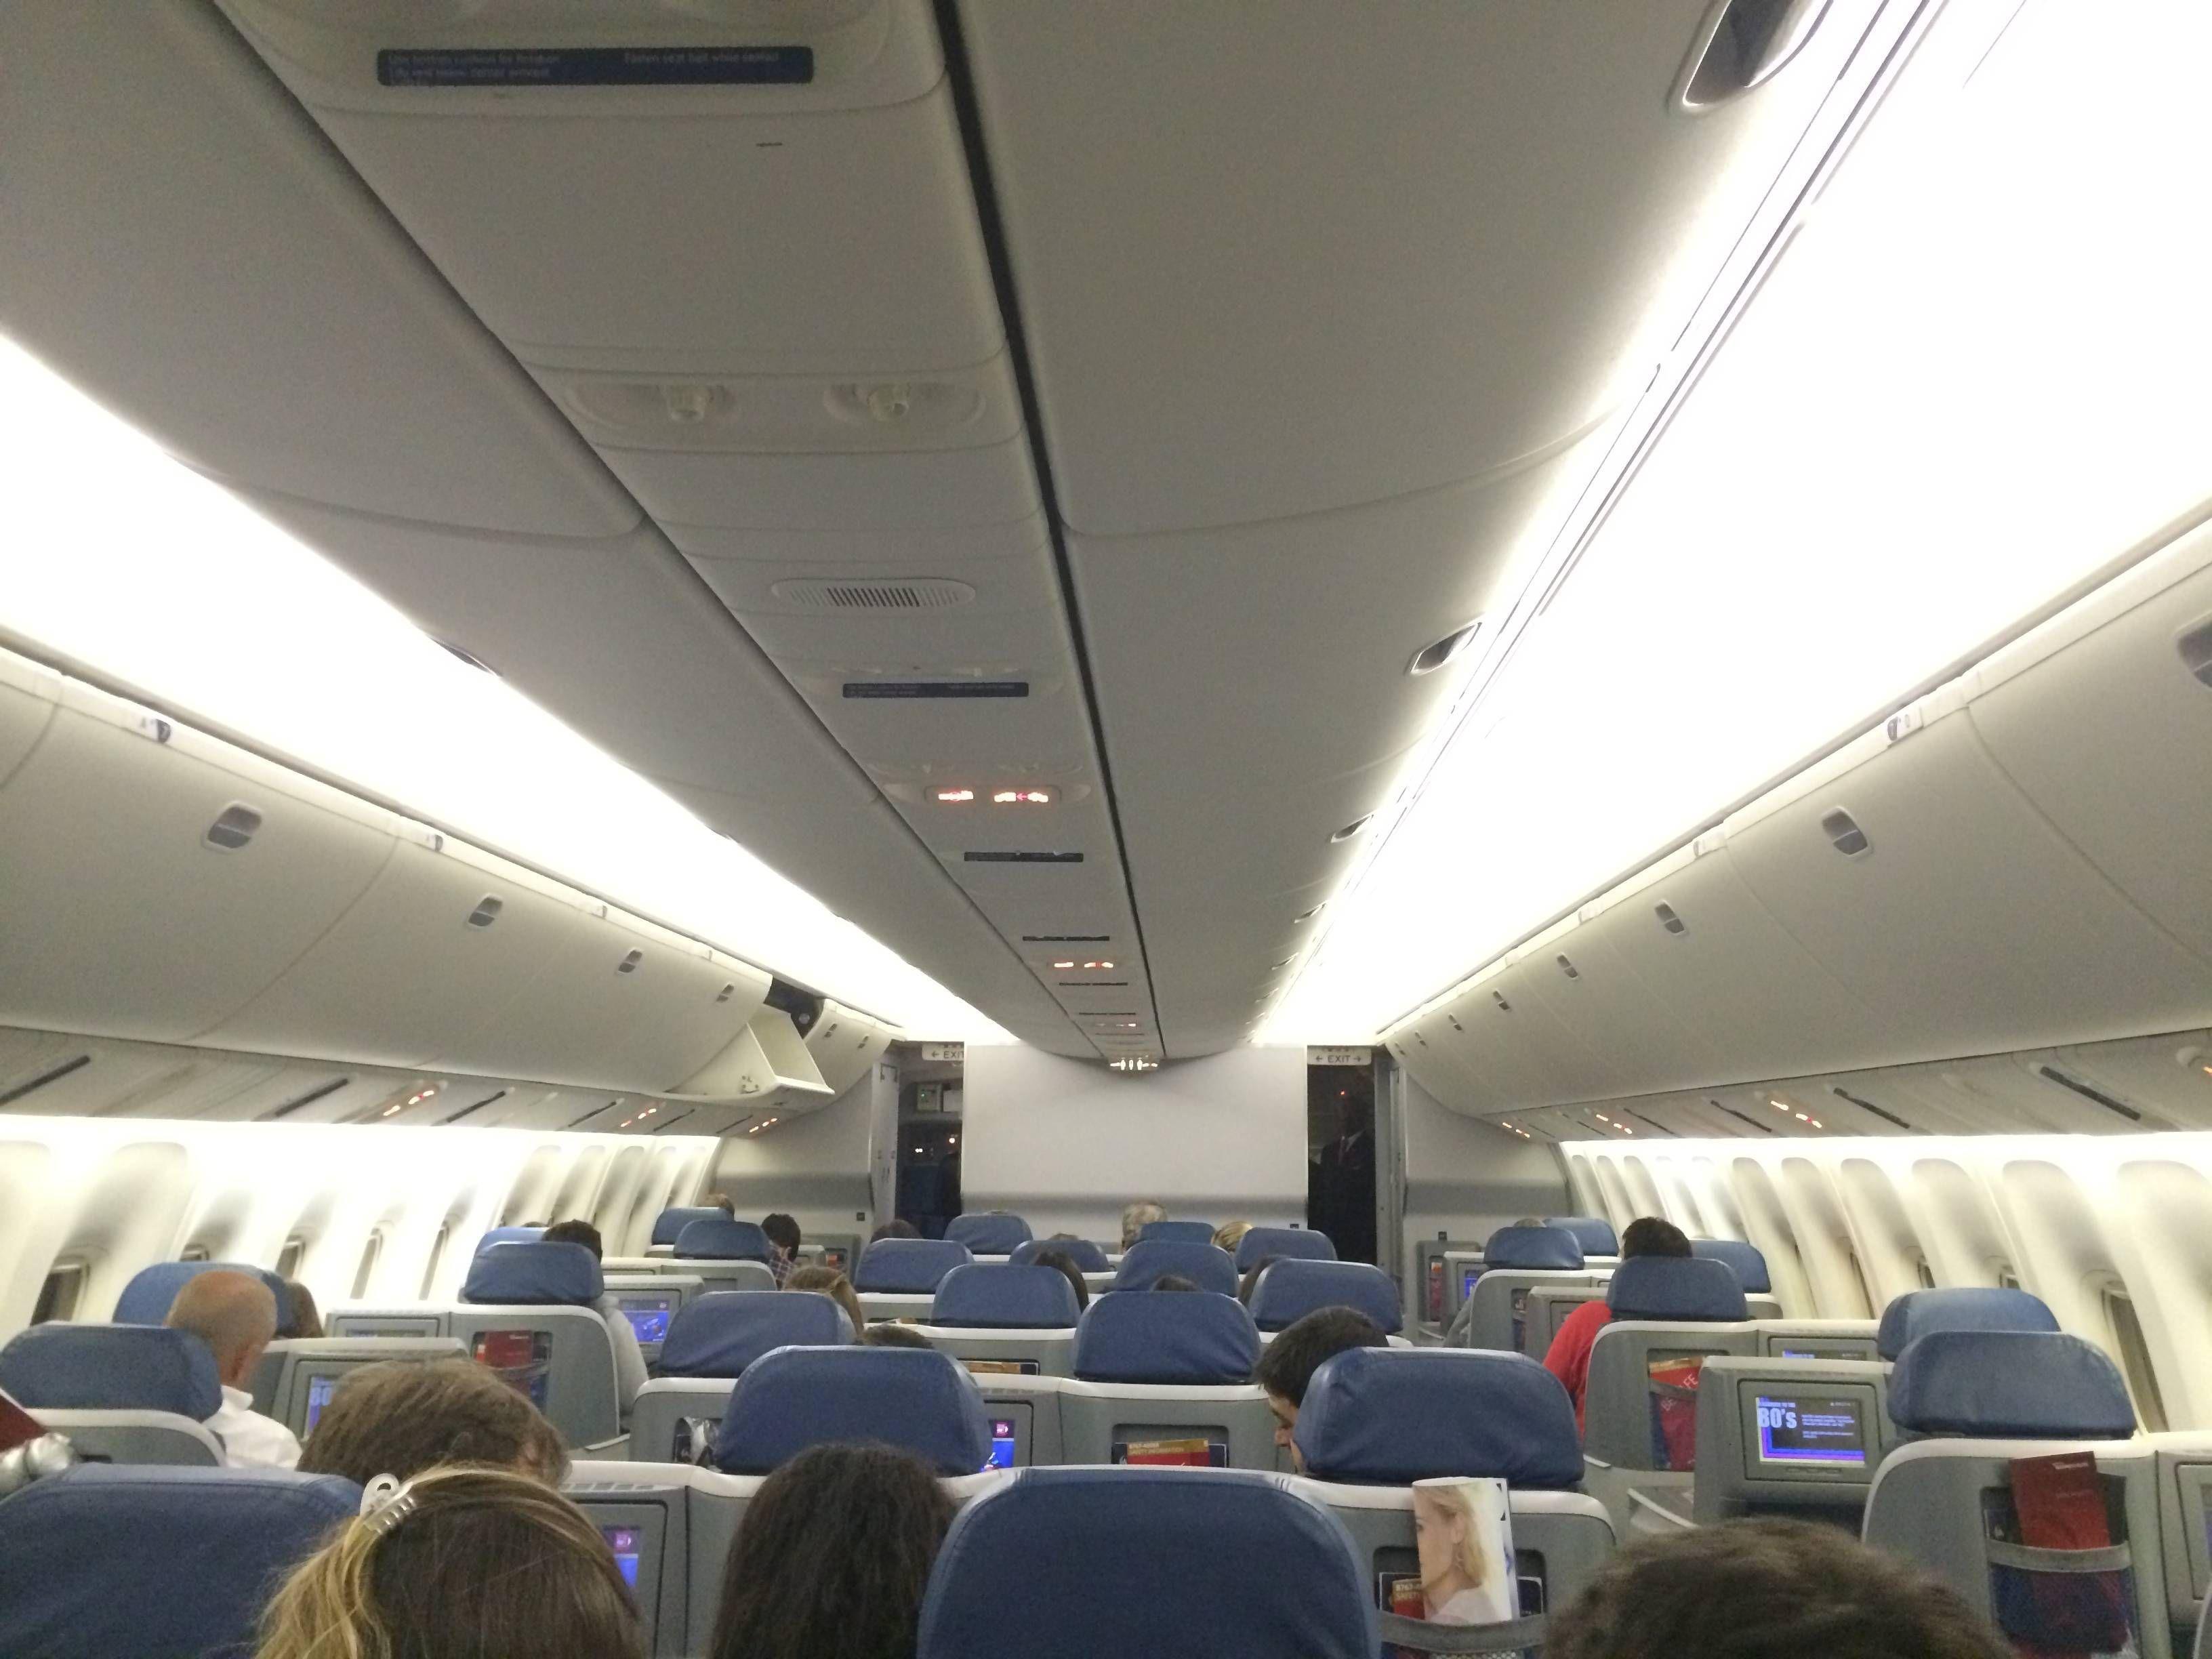 Delta BusinessElite classe executiva b767-400 passageirodeprimeira